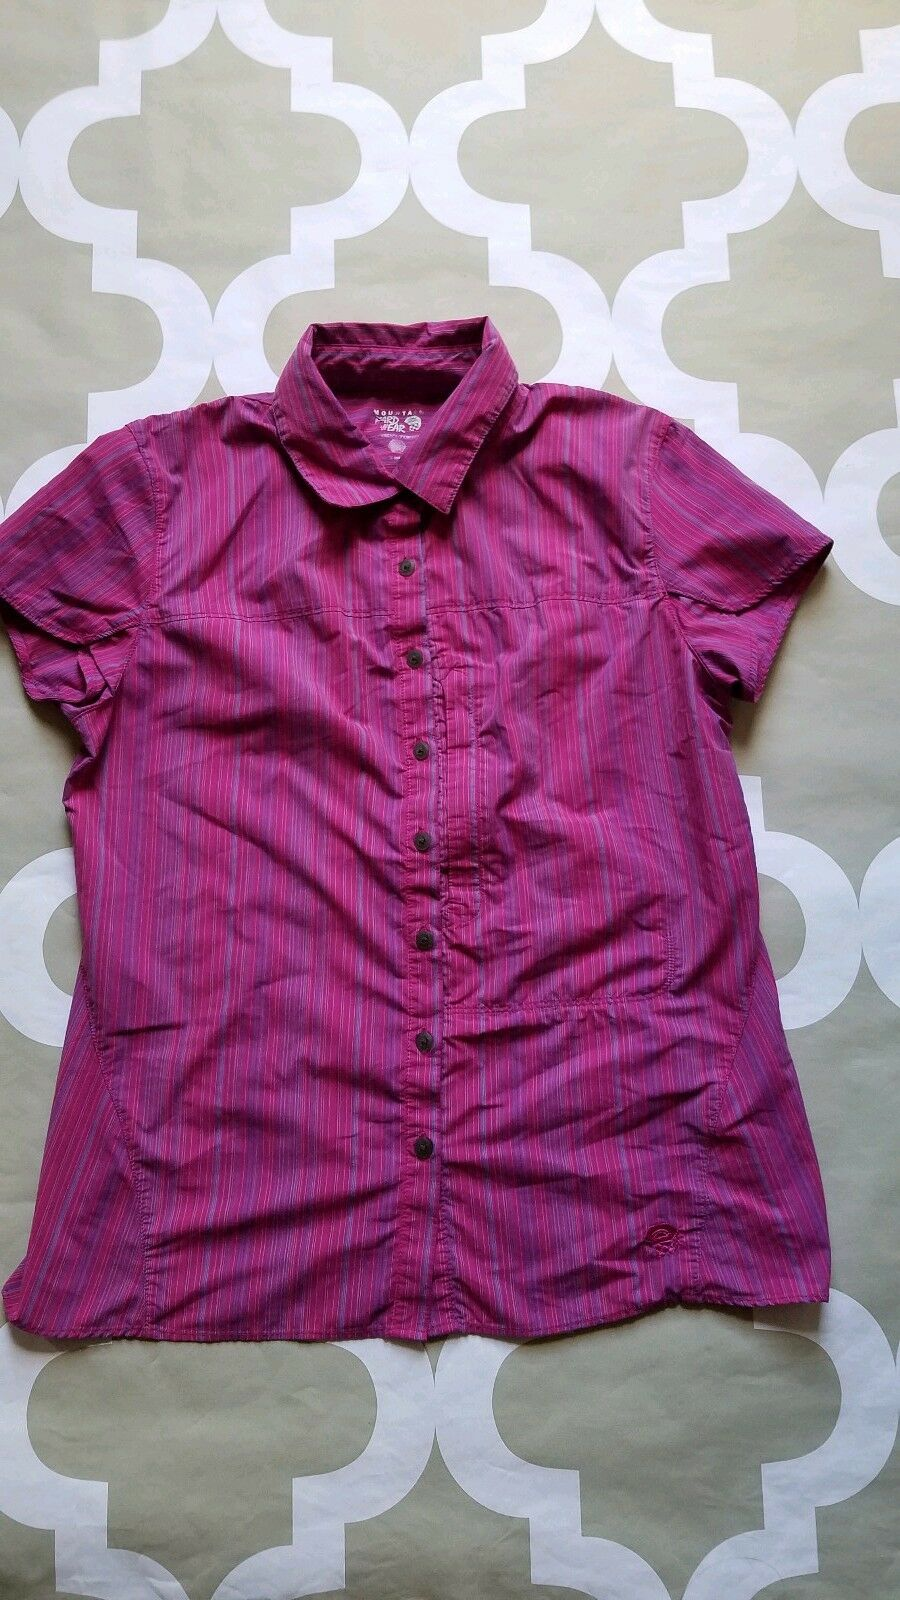 Mountain Hardware Women's button front shirt Size S